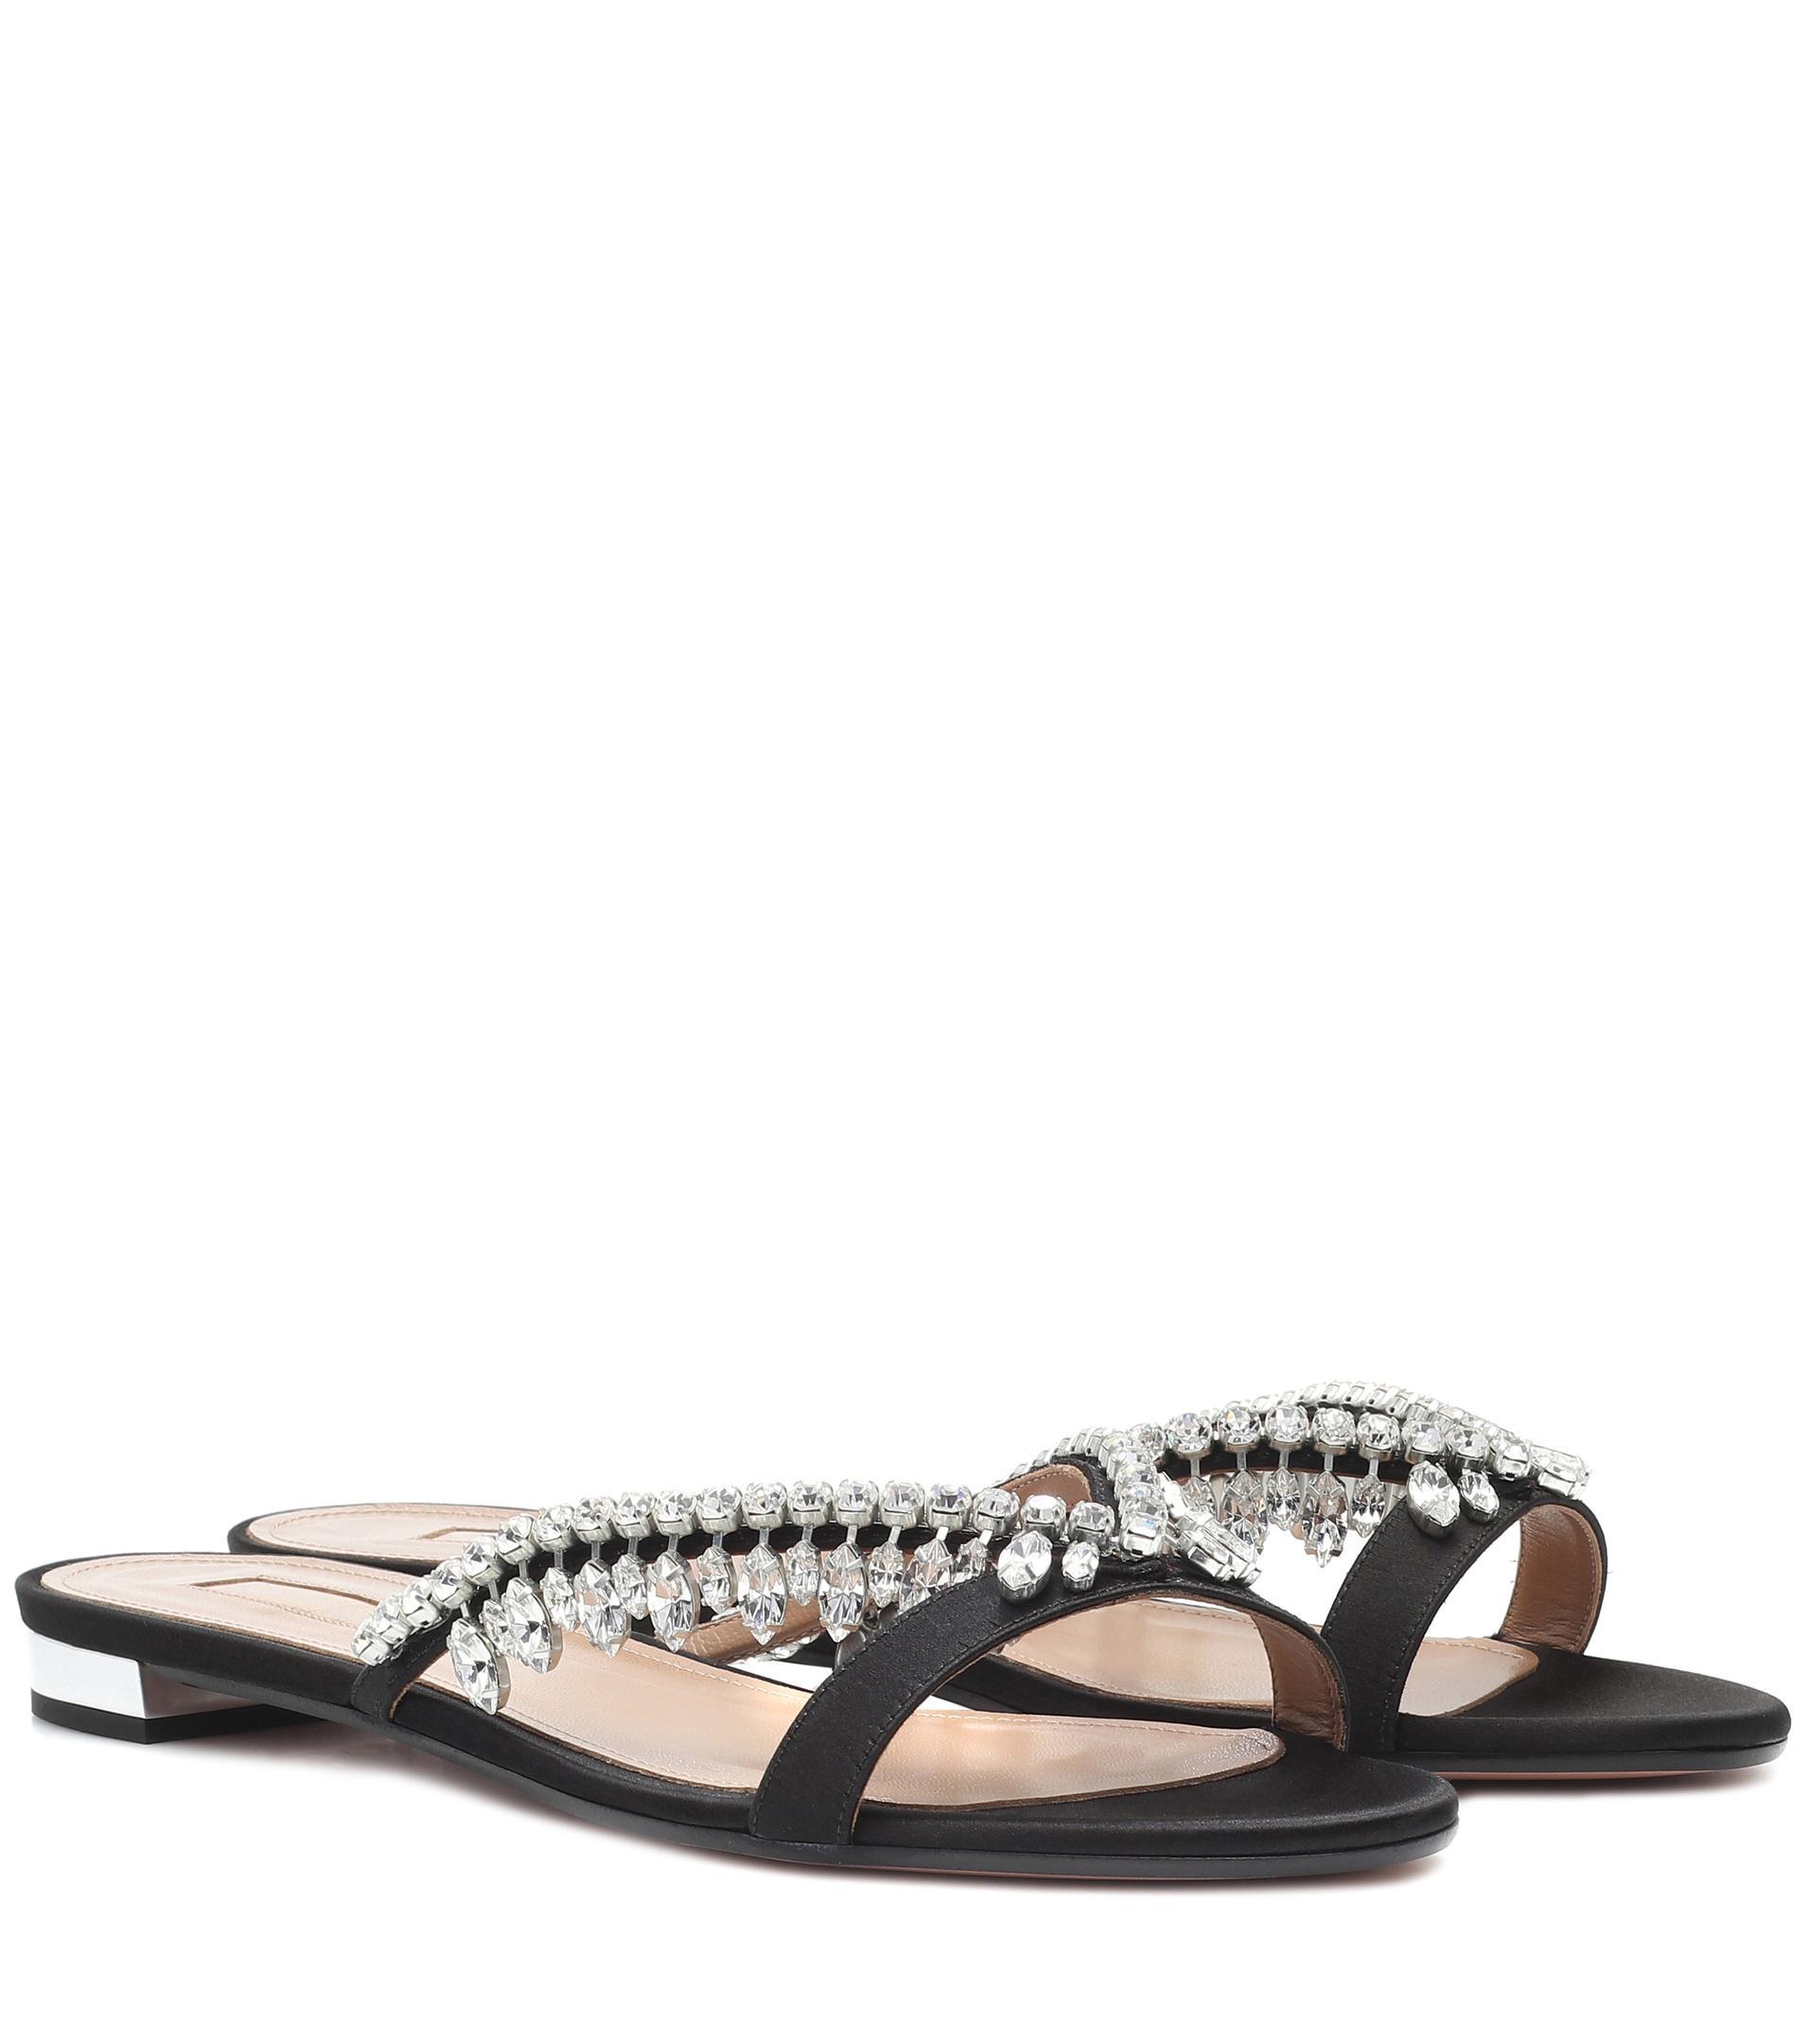 Lyst - Aquazzura Gem Palace Satin Sandals in Black e2fa44f84710